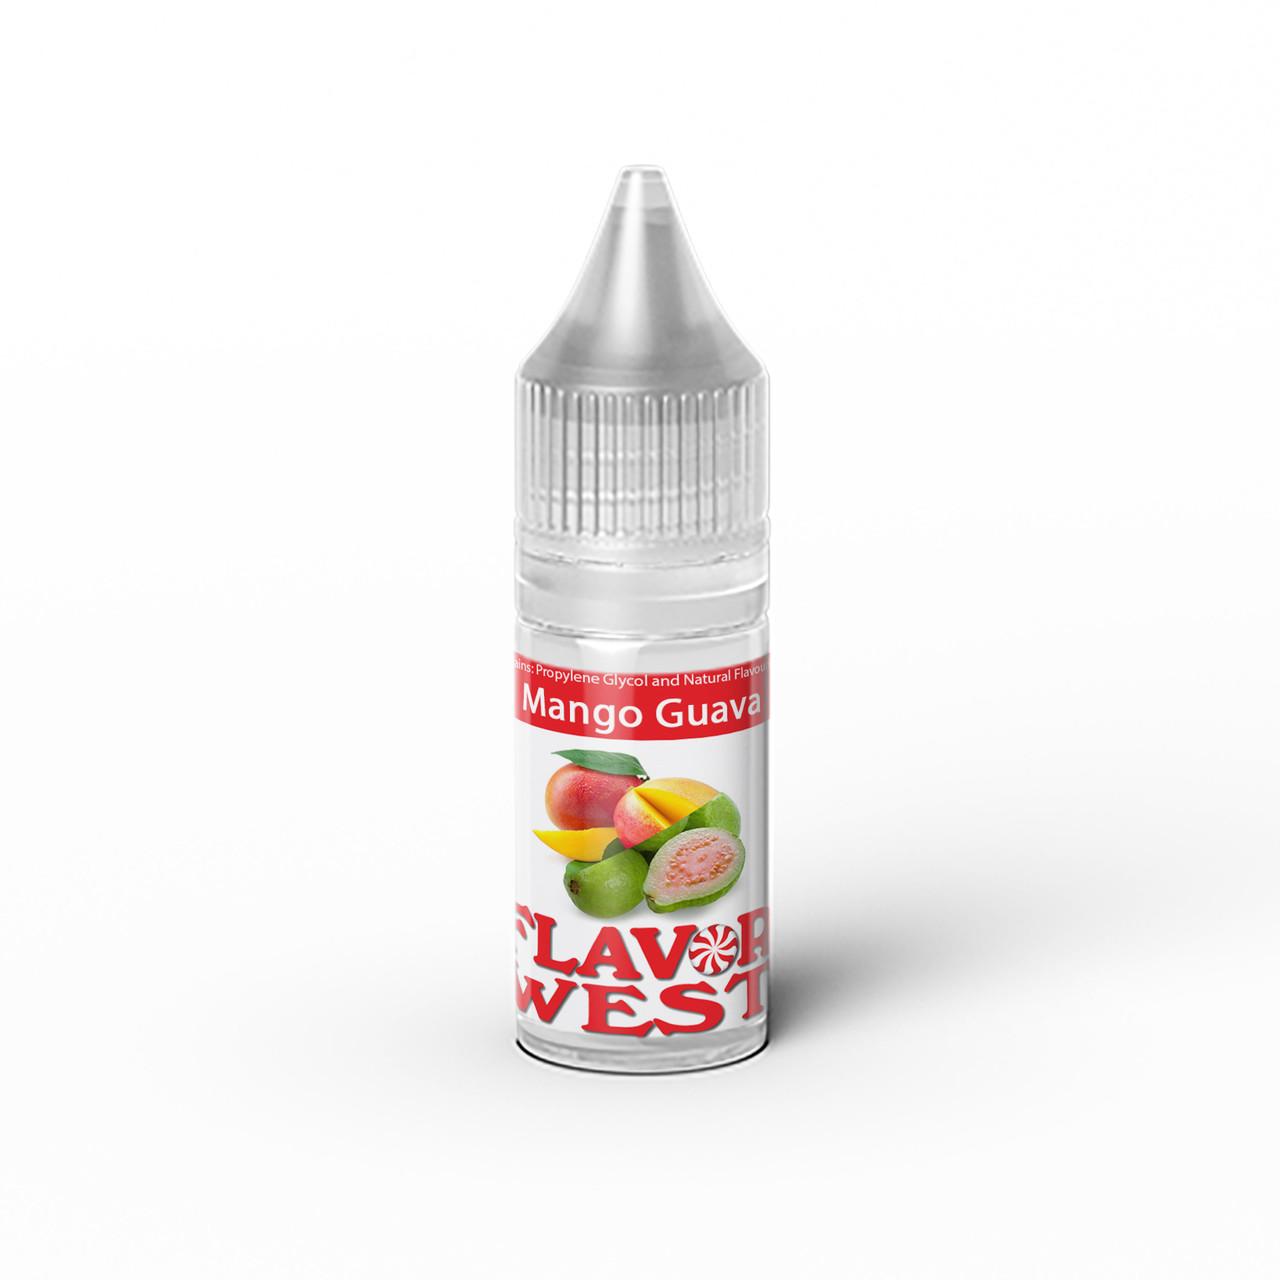 FlavorWest Mango Guava